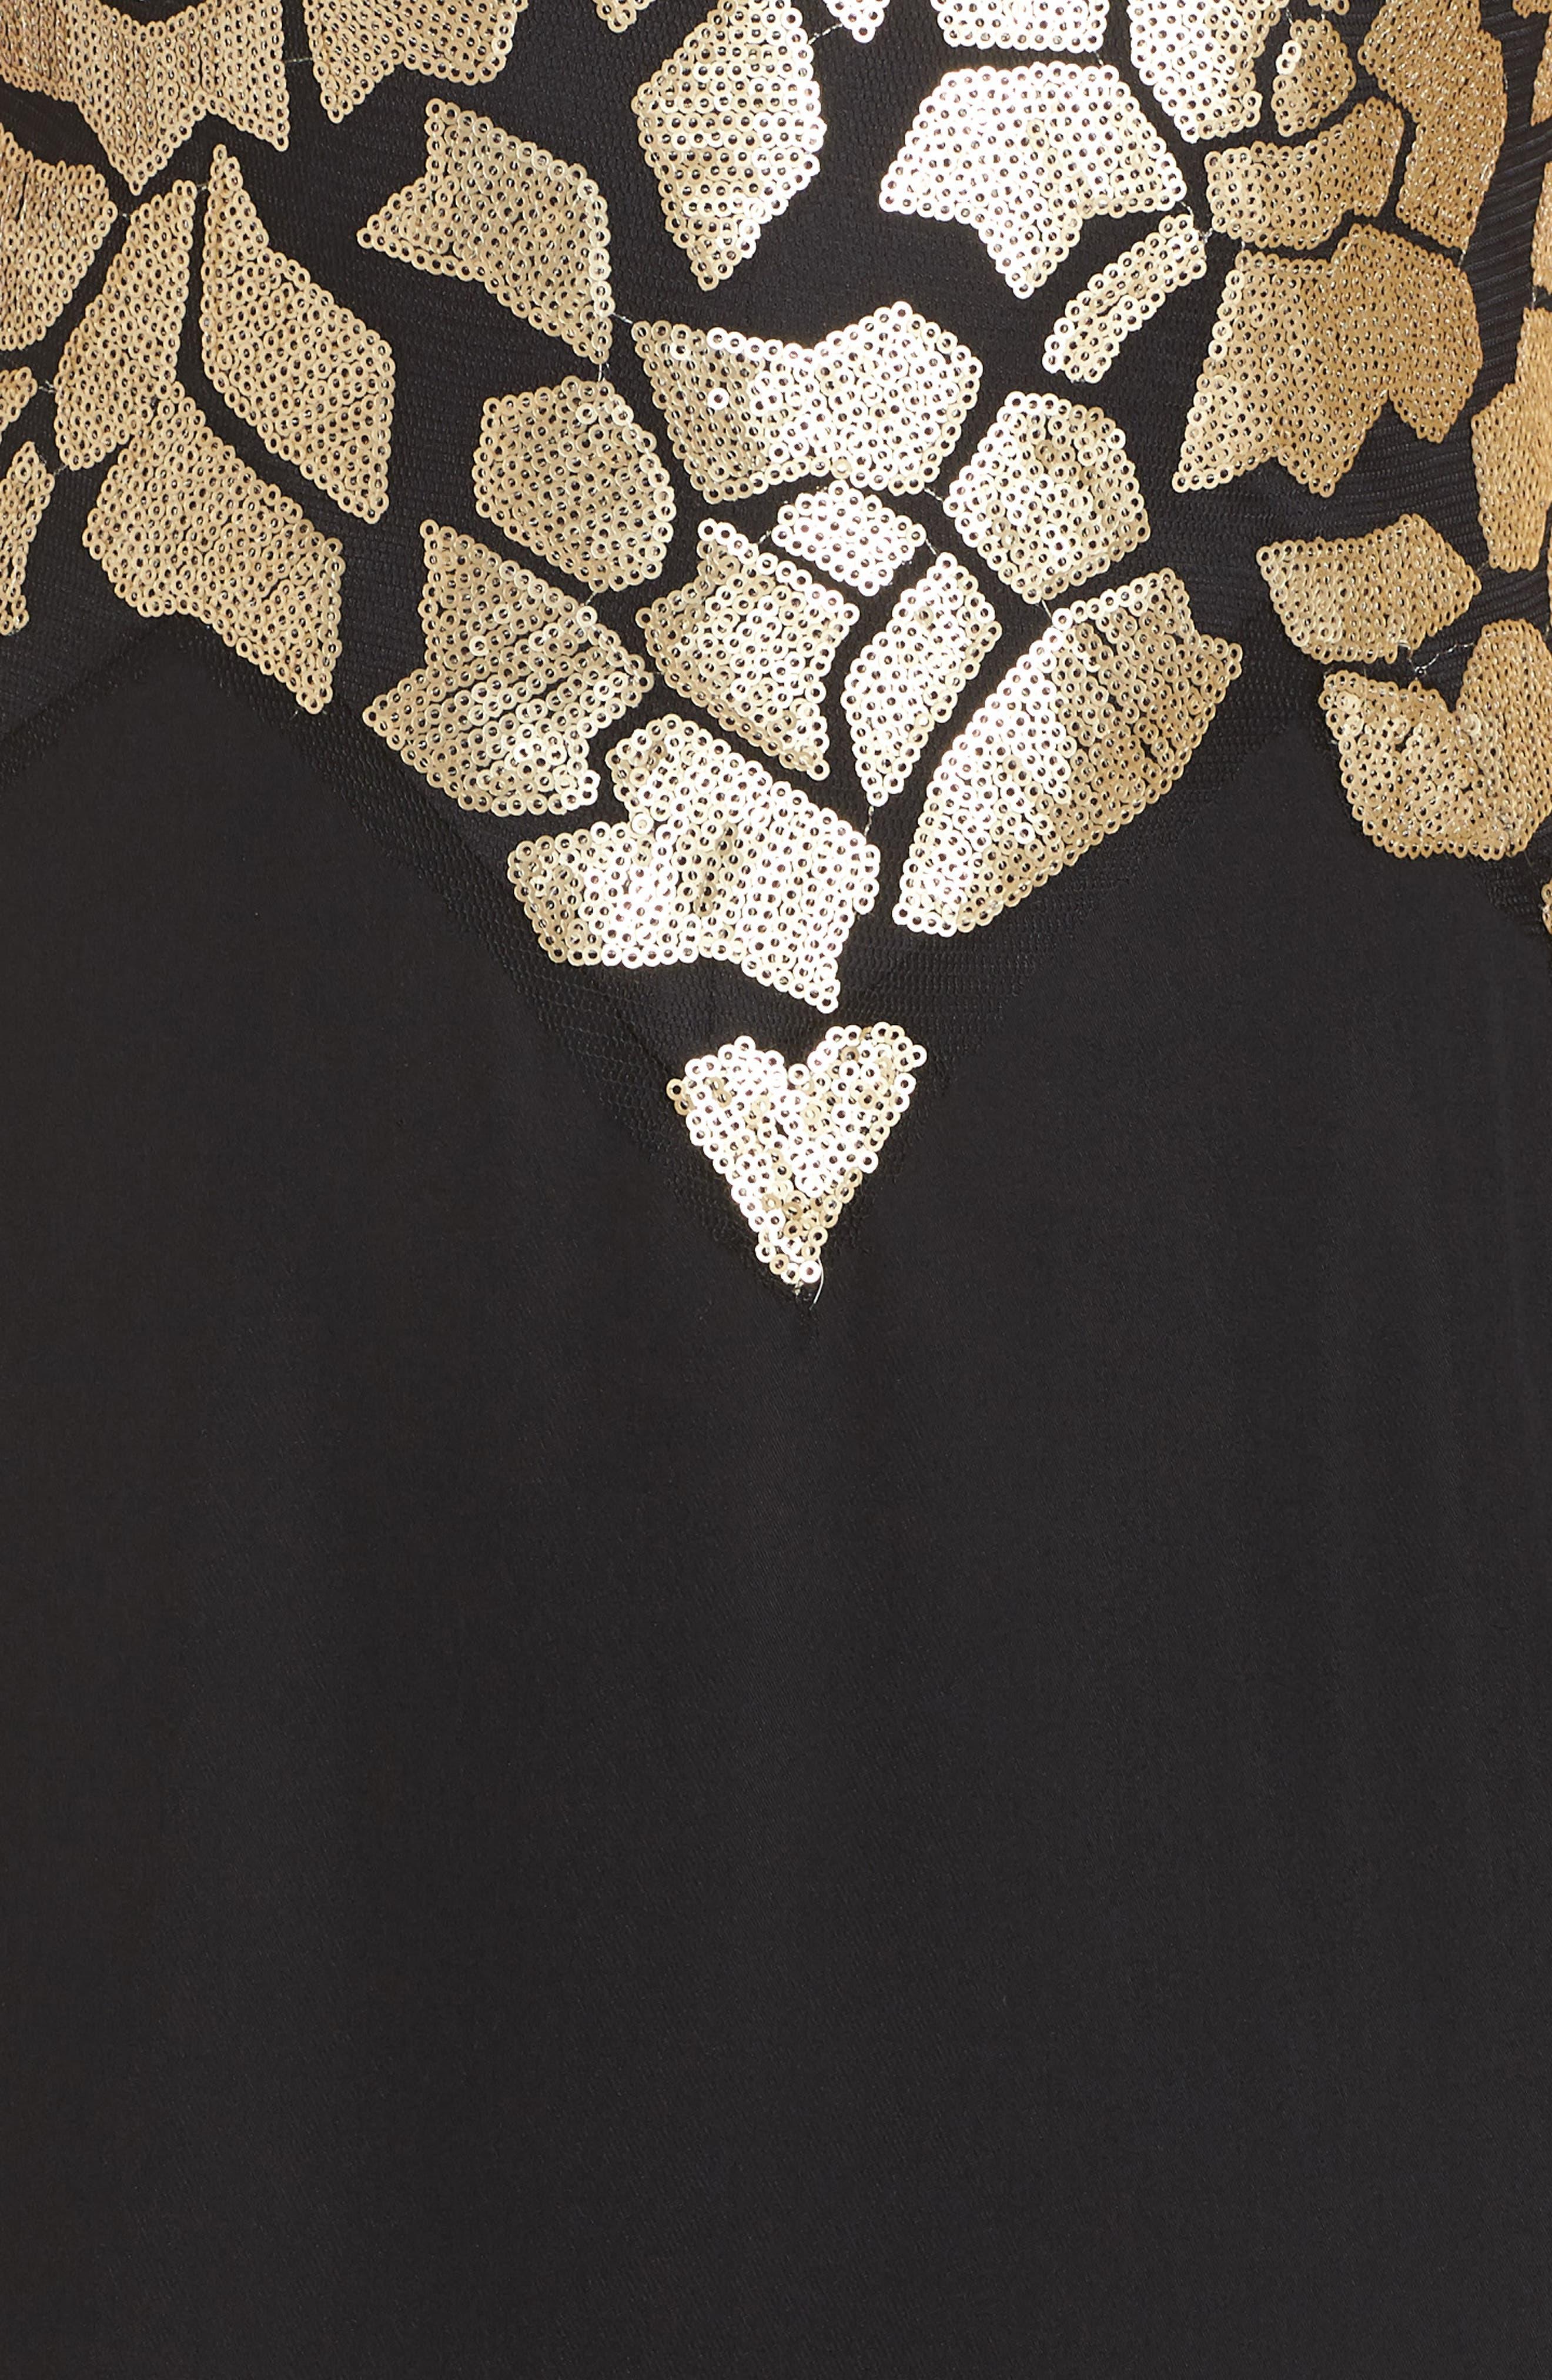 Sleeveless Sequin & Crepe Gown,                             Alternate thumbnail 6, color,                             BLACK/ GOLD